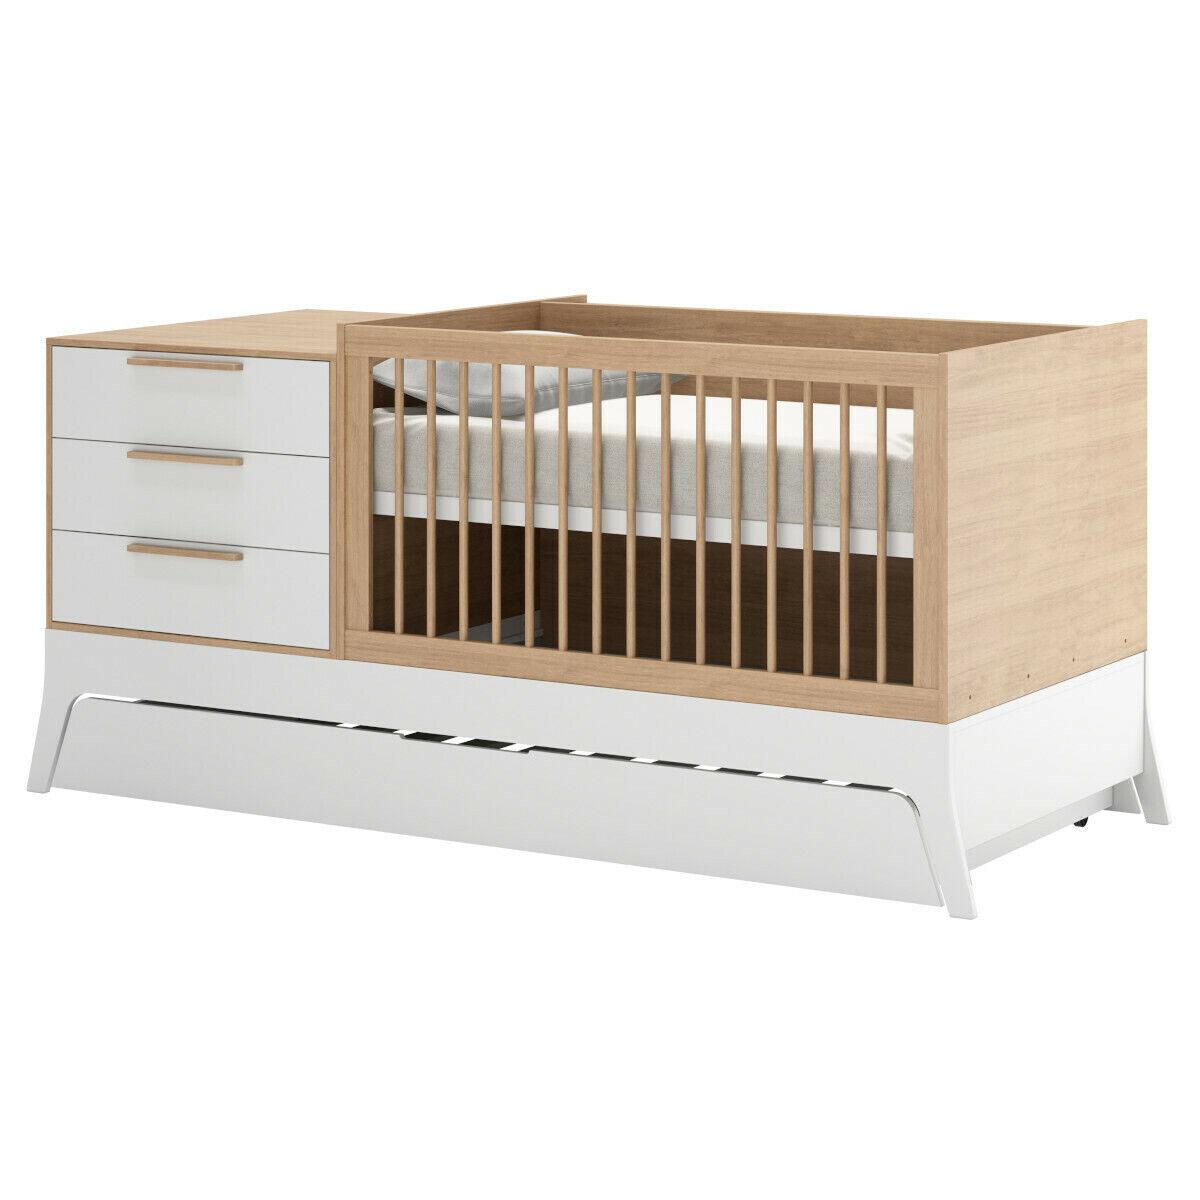 ID Kids Lit bébé combiné, évolutif Bois massif, MDF 70x140 Blanc, bois